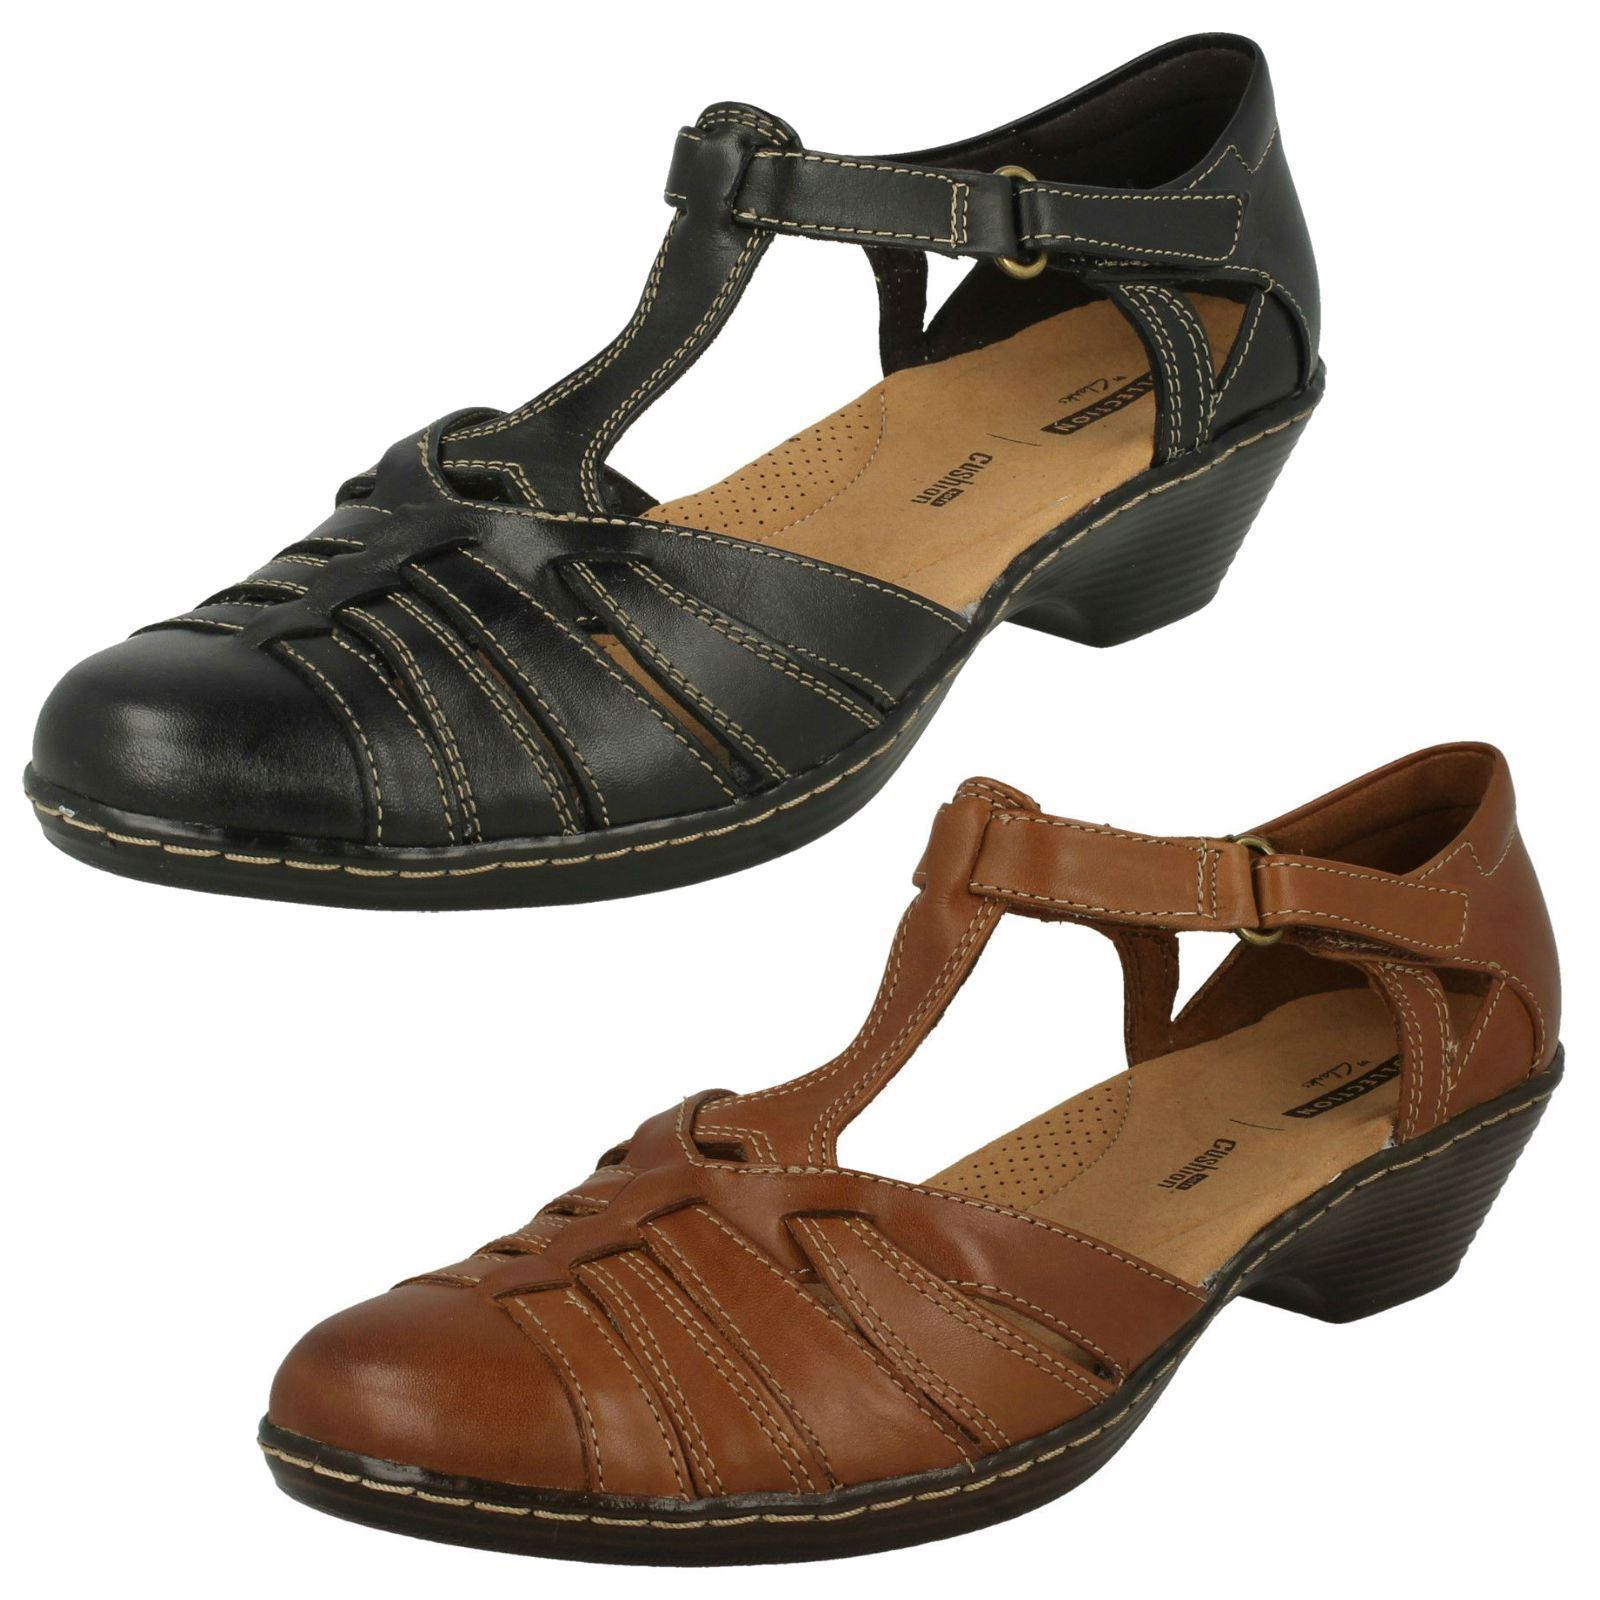 Clarks Wendy alto da donna marroncino zeppa scarpe stile T-BAR